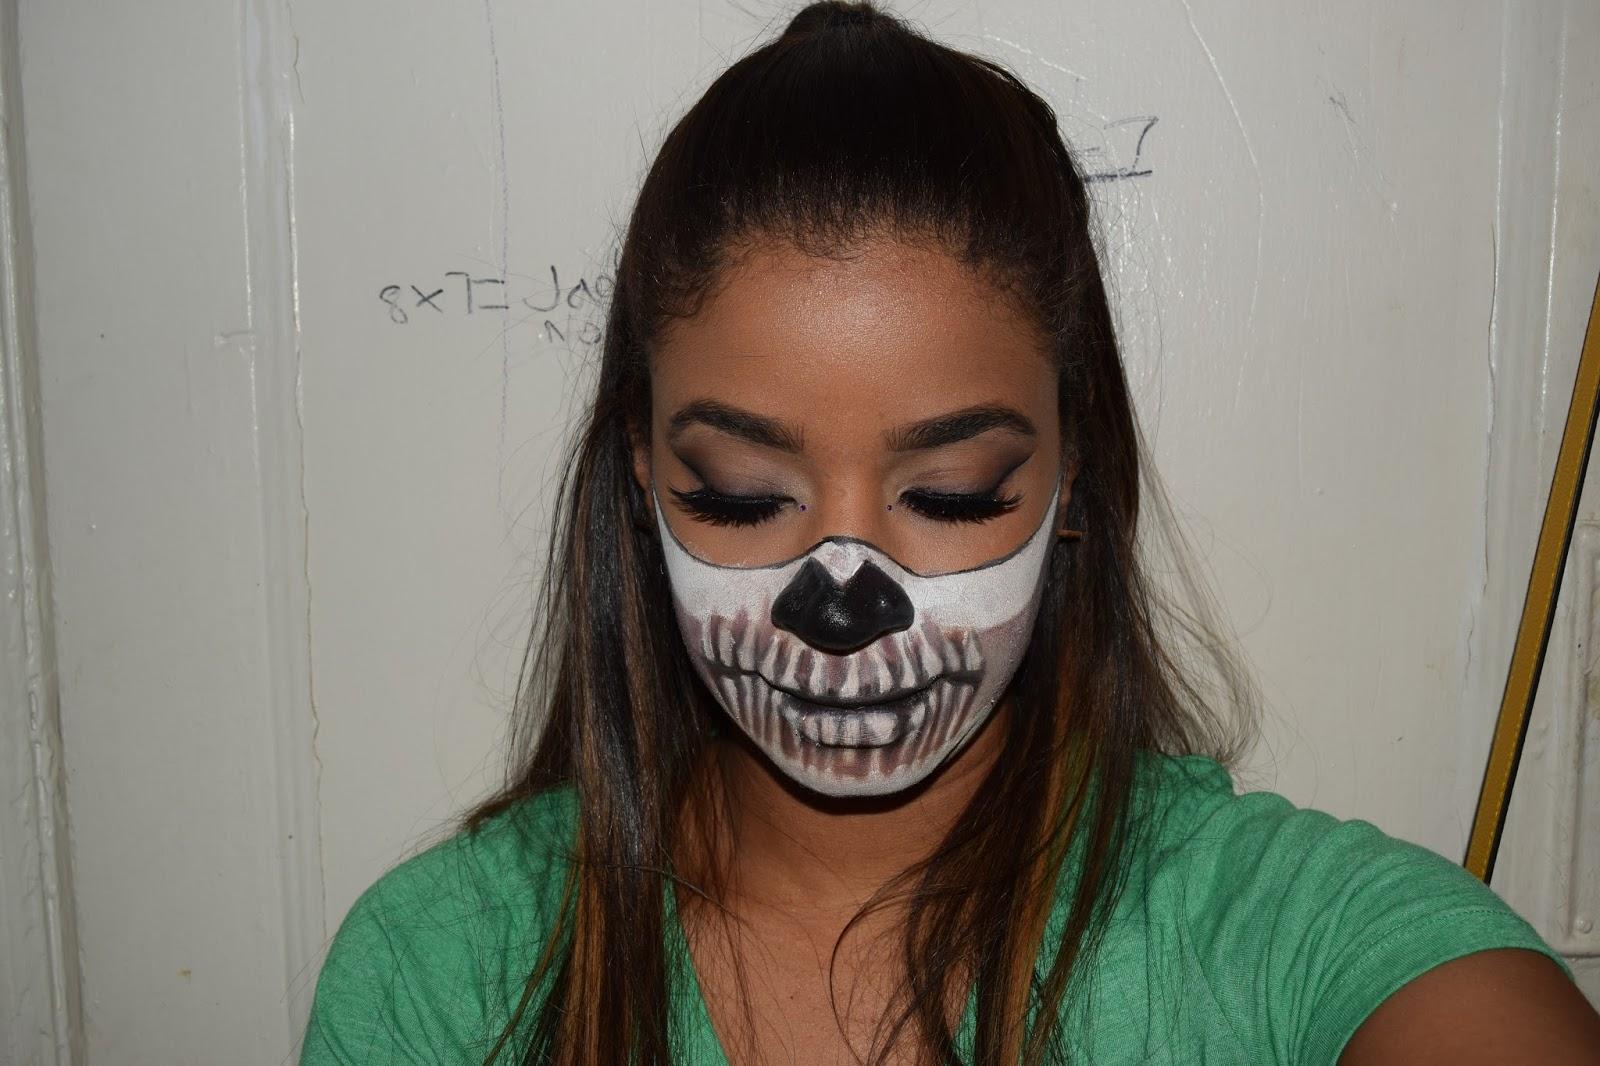 Havtastic: Halloween Look: Half-Skull Mask